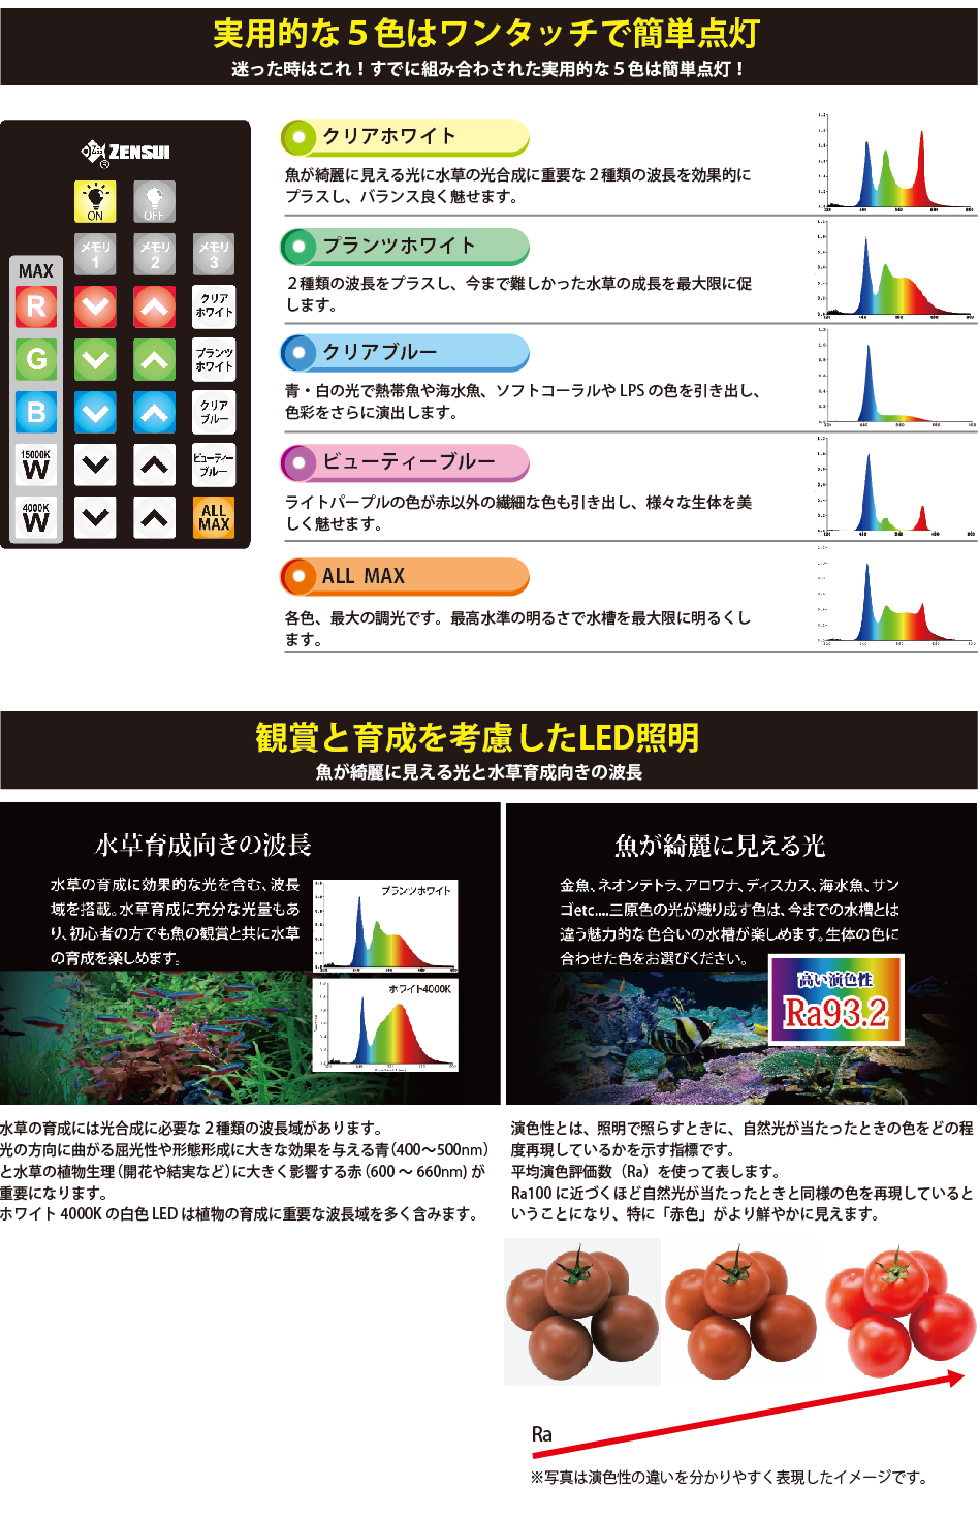 ZENSUI MULTI COLOR LED / ゼンスイ マルチカラー LED 使用説明